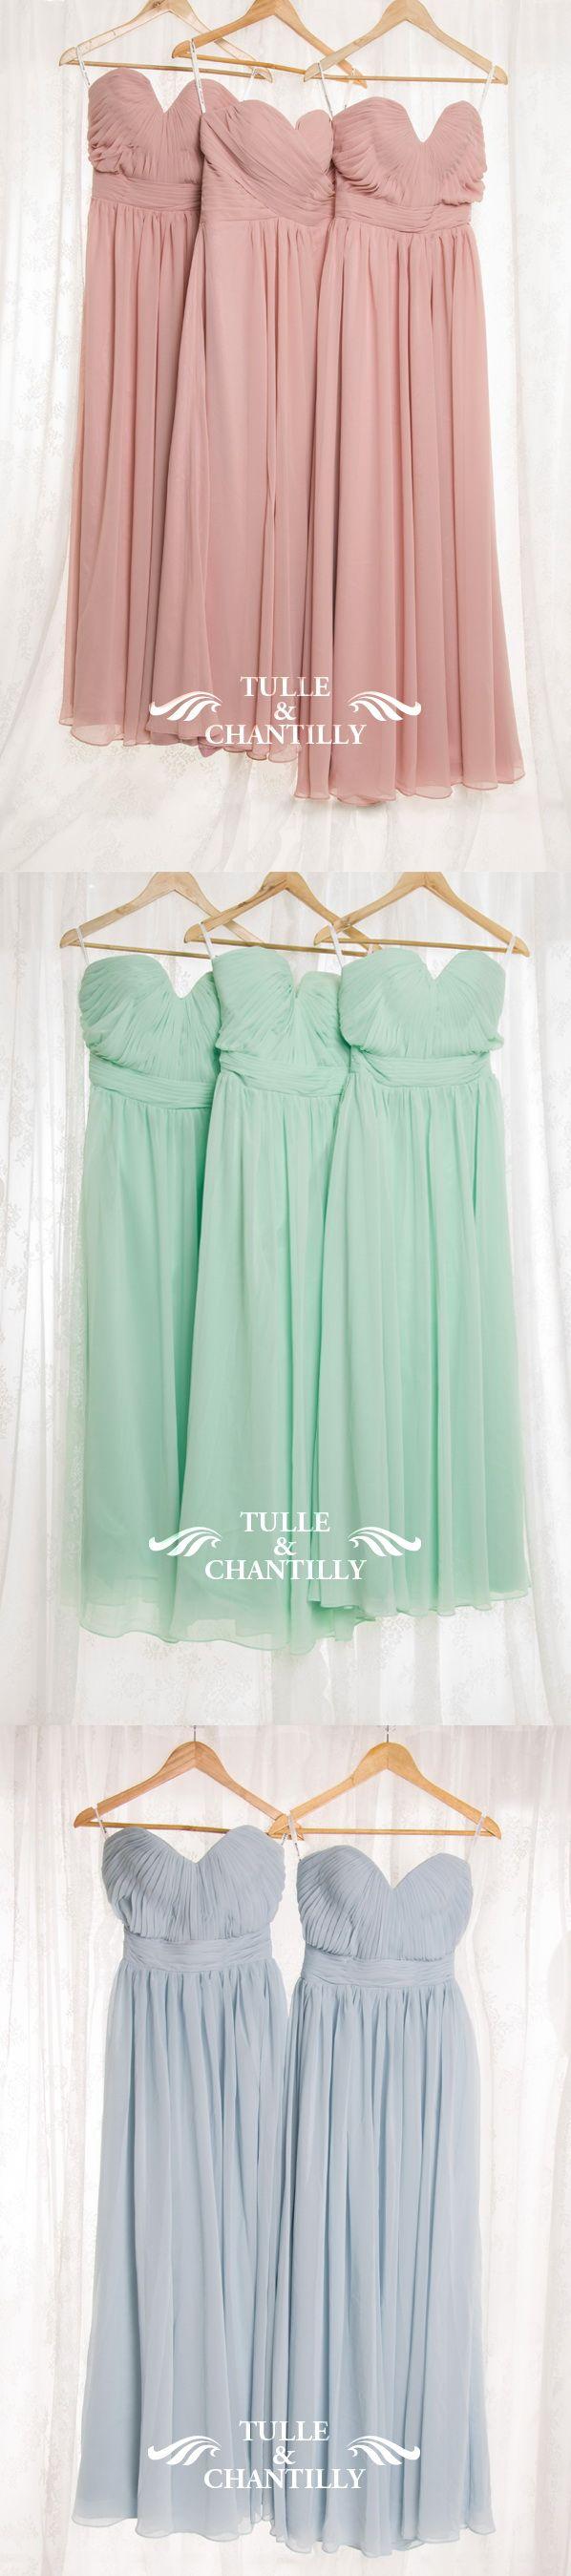 best bridesmaids images on pinterest bridal gowns short